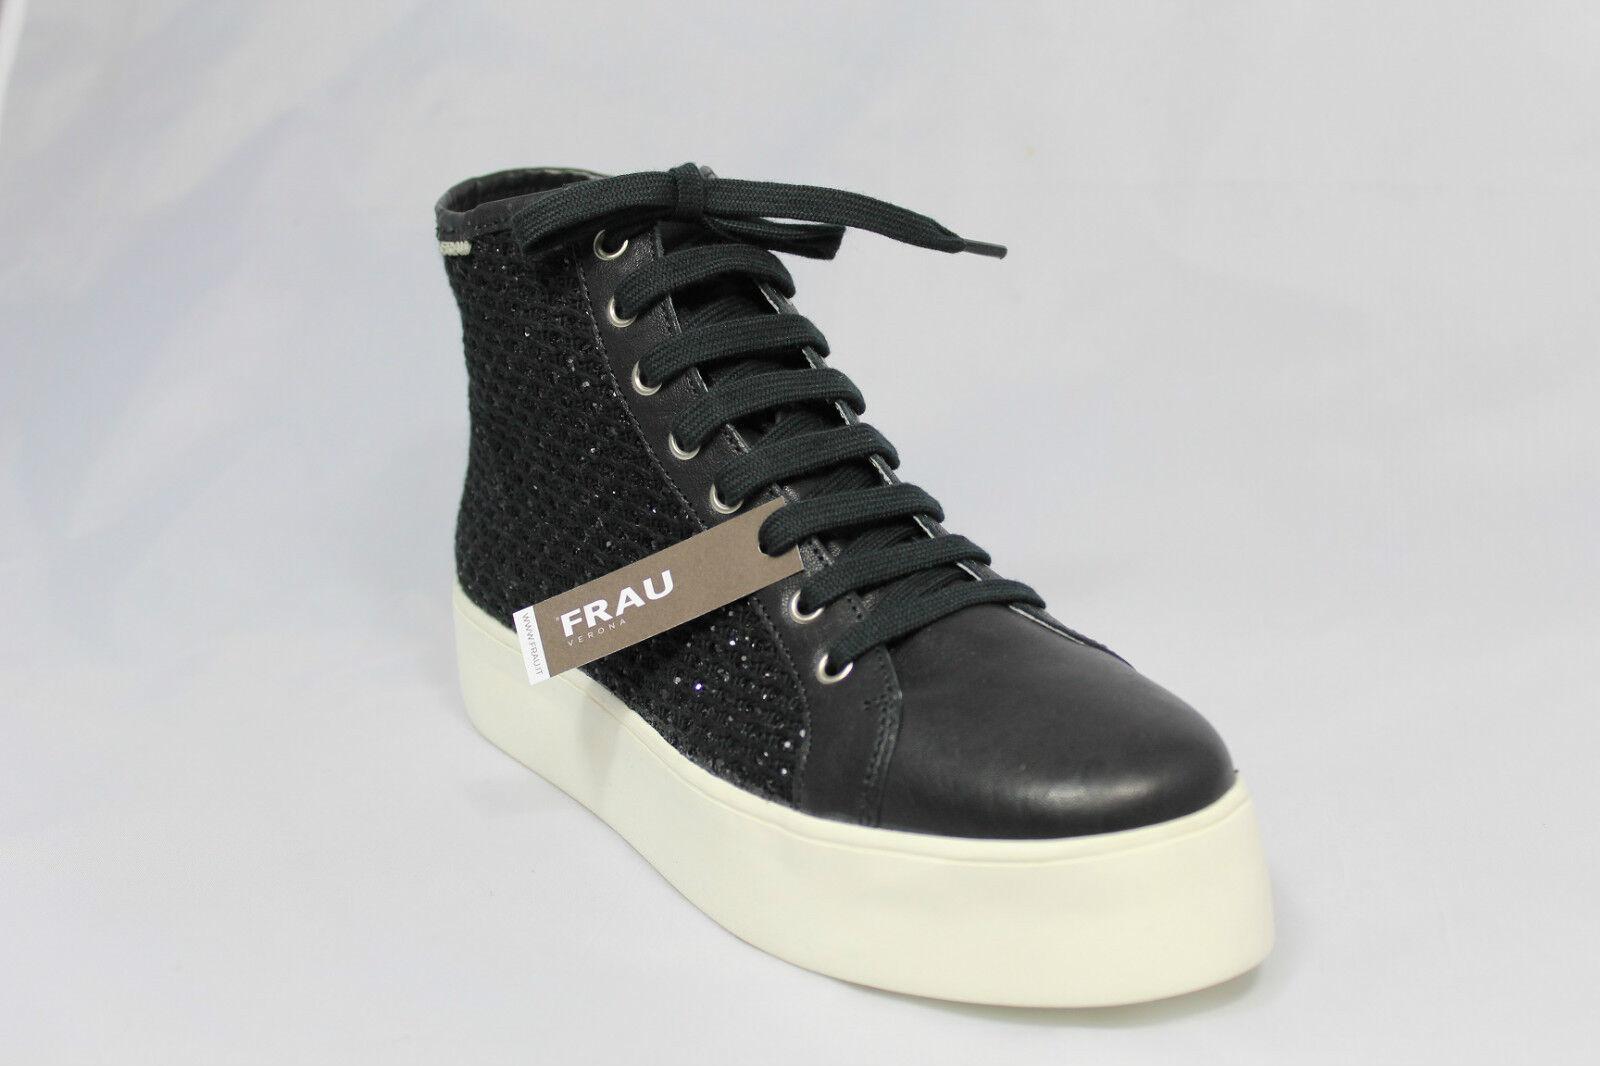 schuhe Damens FRAU POLACCHINO PELLE E TESSUTO 37L5 NERO MADE IN ITALY  Schuhe